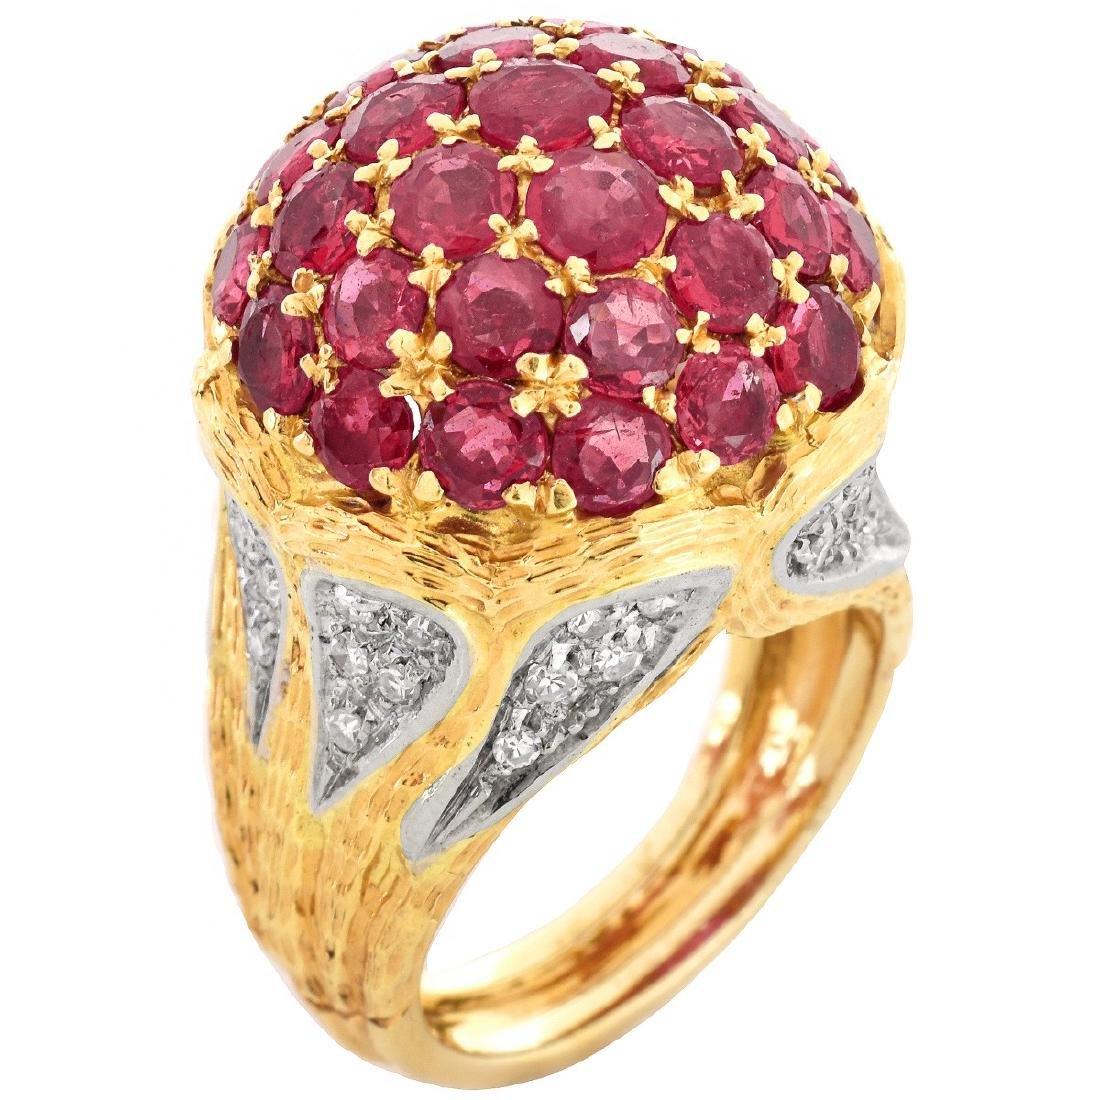 Spitzer & Furhmann Ruby and Diamond Ring